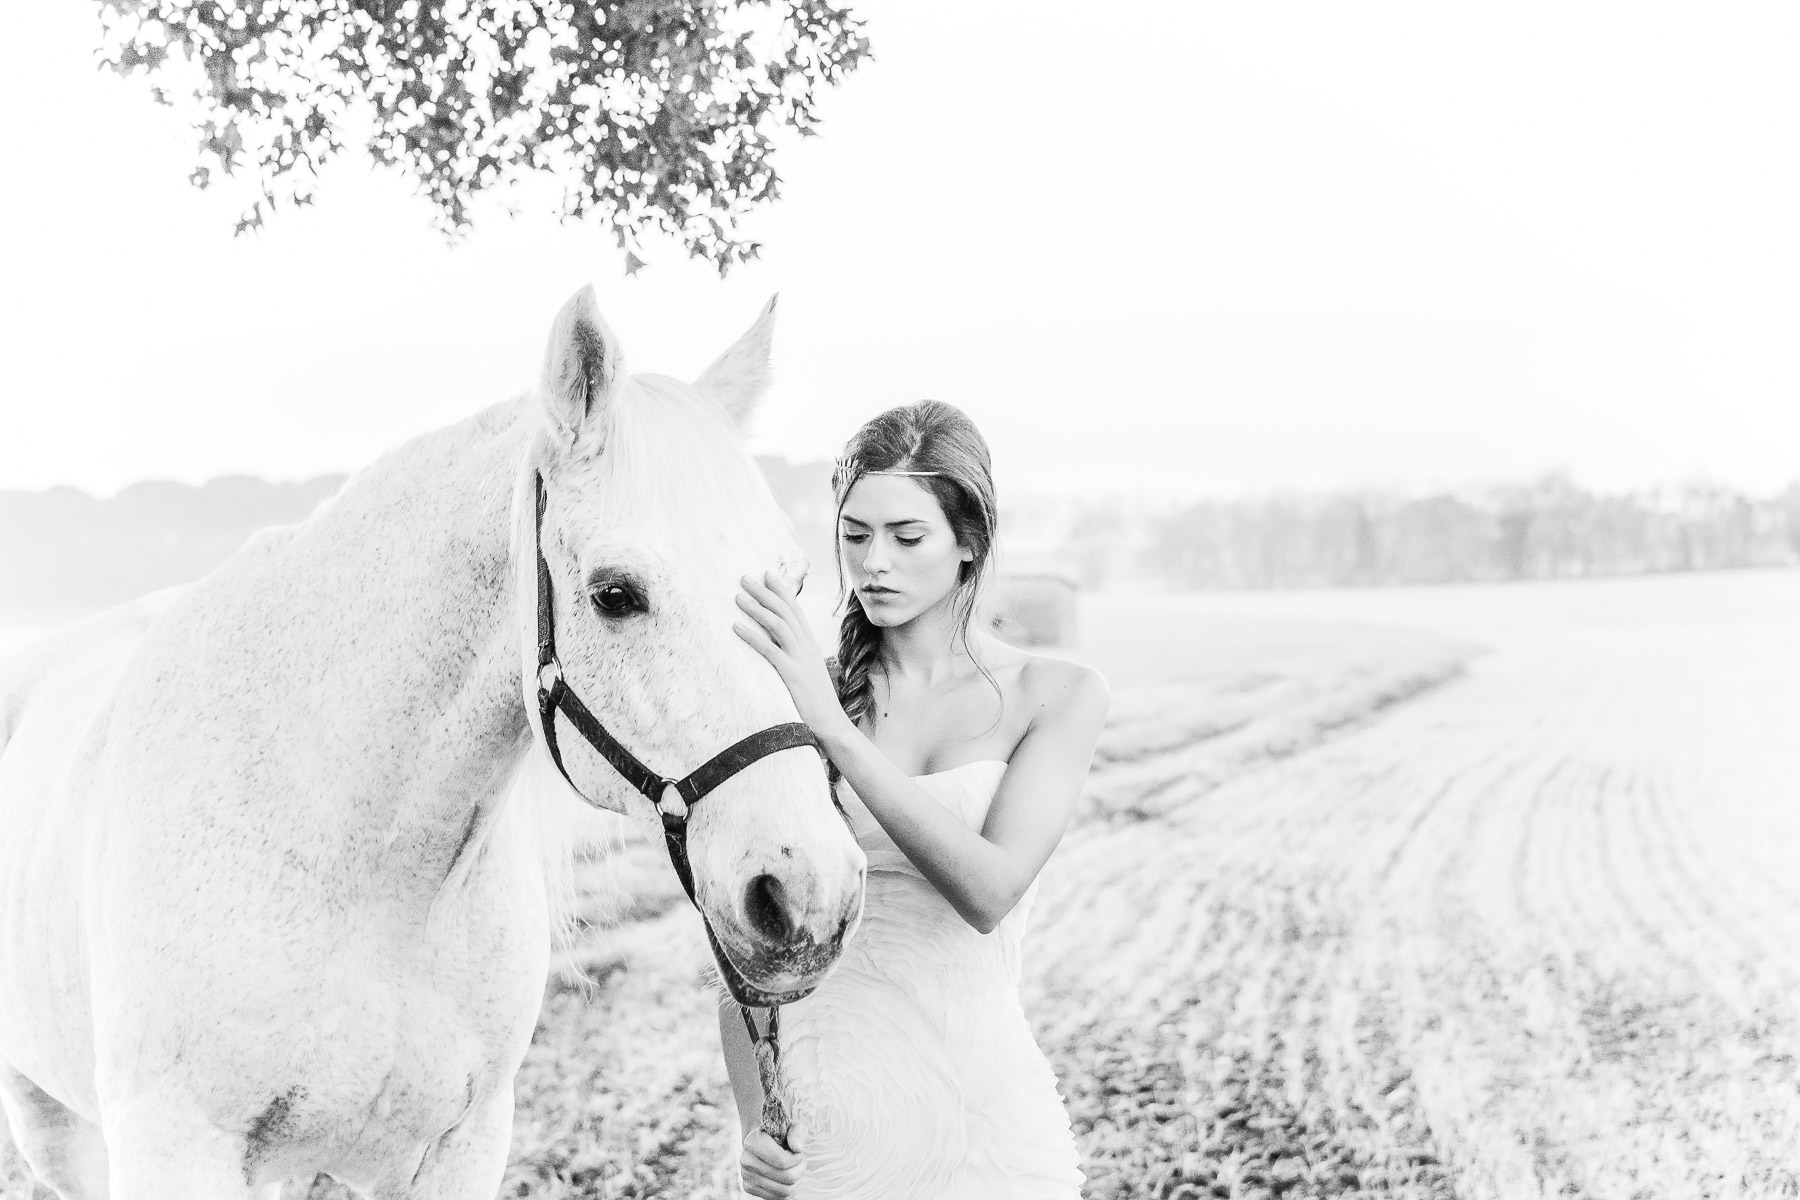 bride-and-horse-hotos-together-inspiration